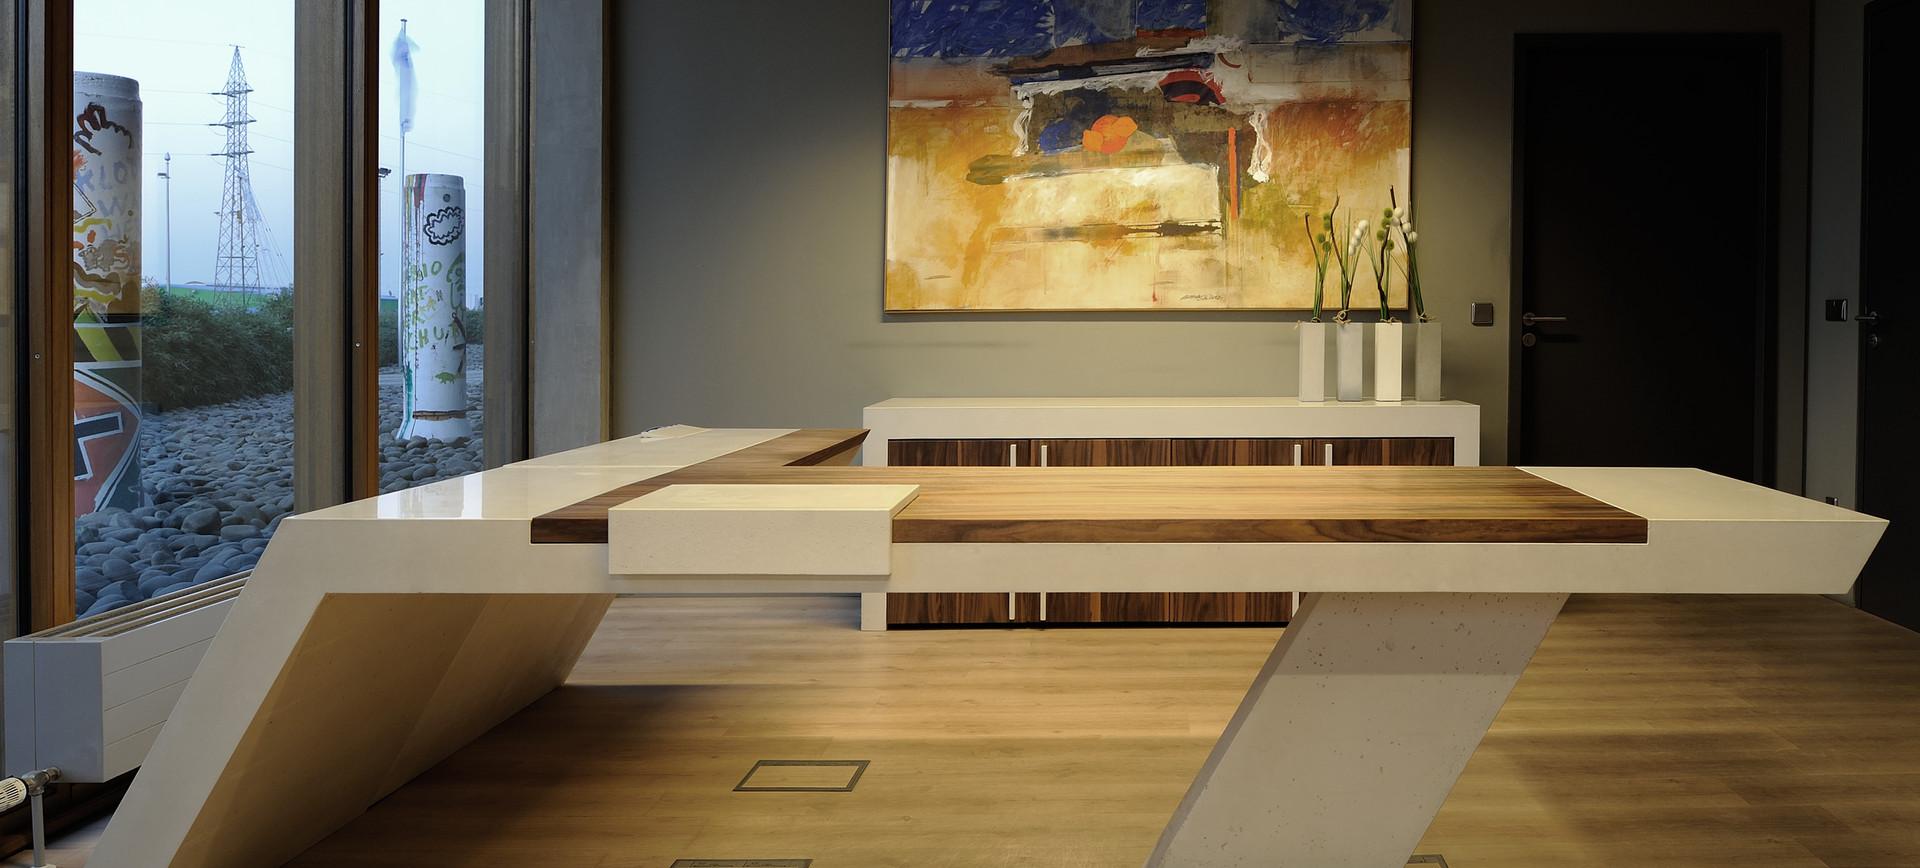 Custom Concrete Office Desk